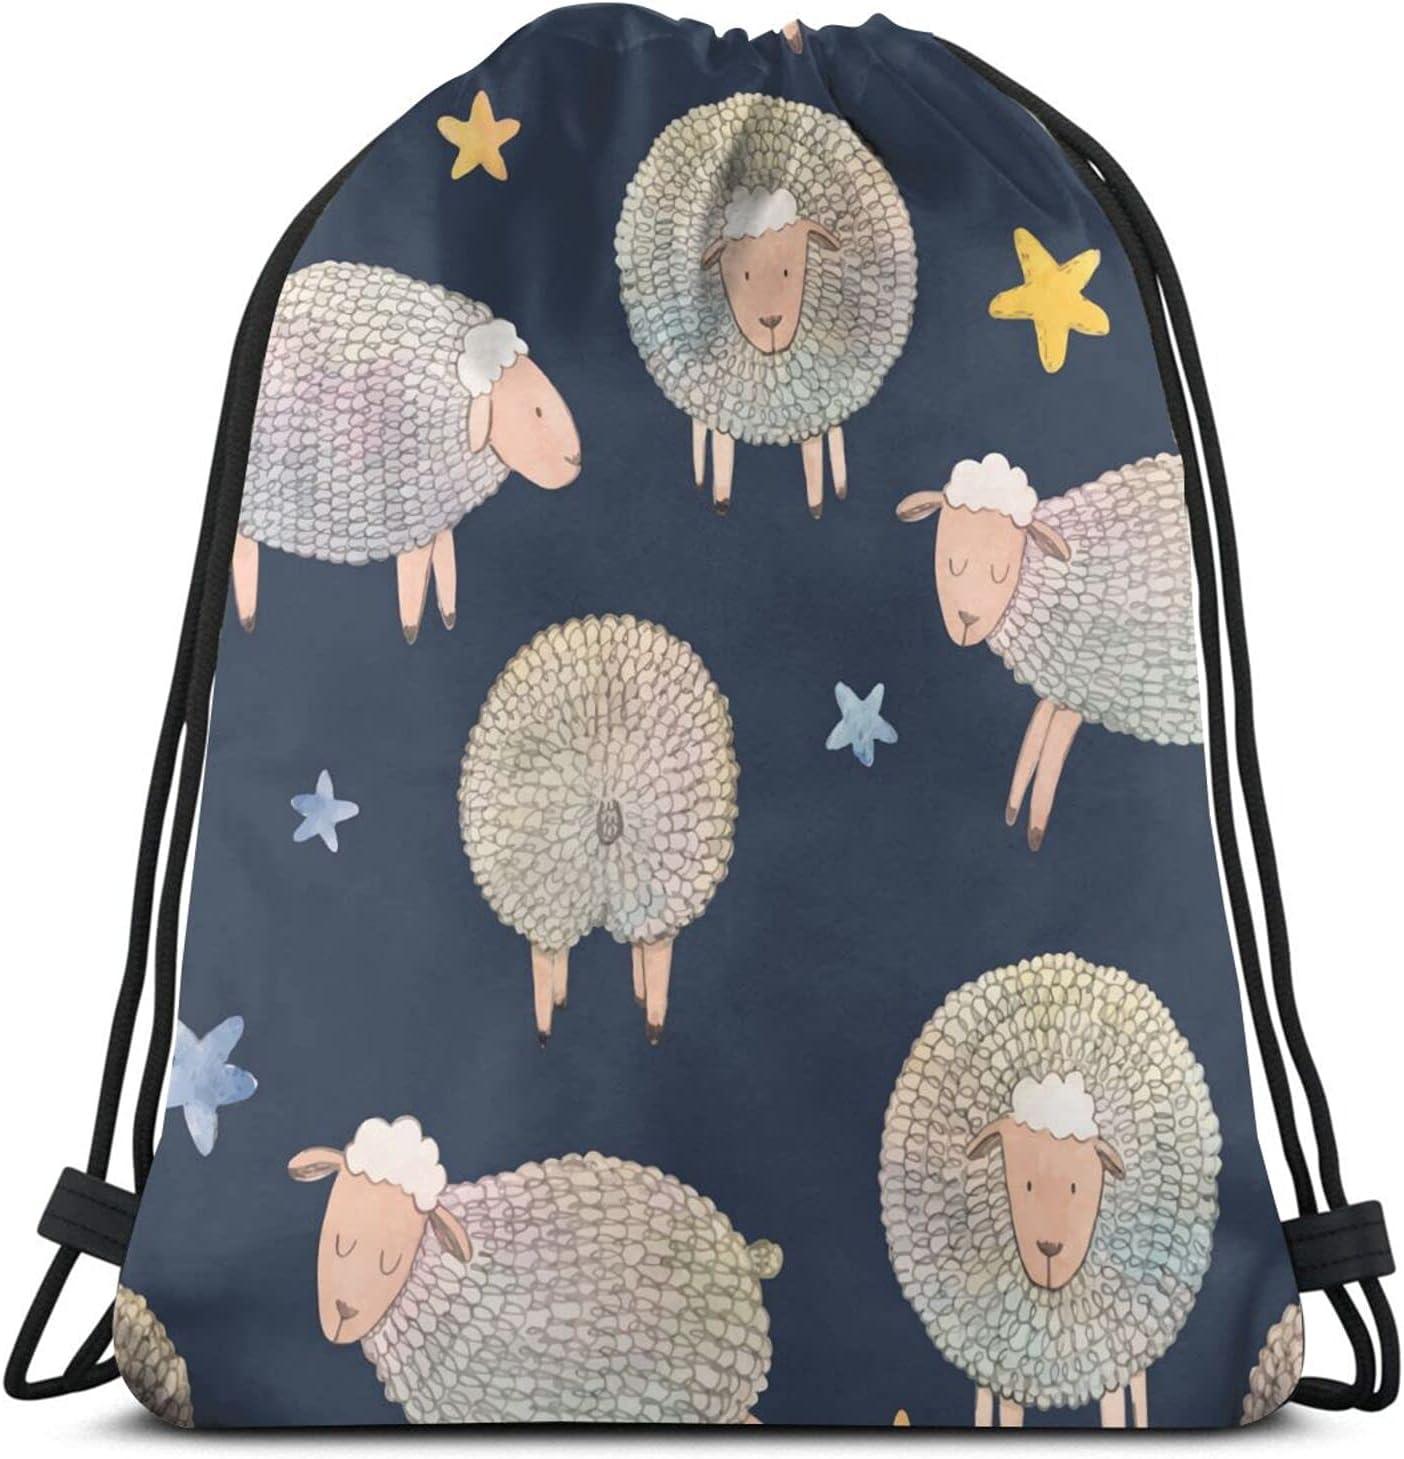 Doodle Sheep Stars Drawstring Backpack Yoga Bag Max 79% OFF Hikin Max 43% OFF Gym Sports